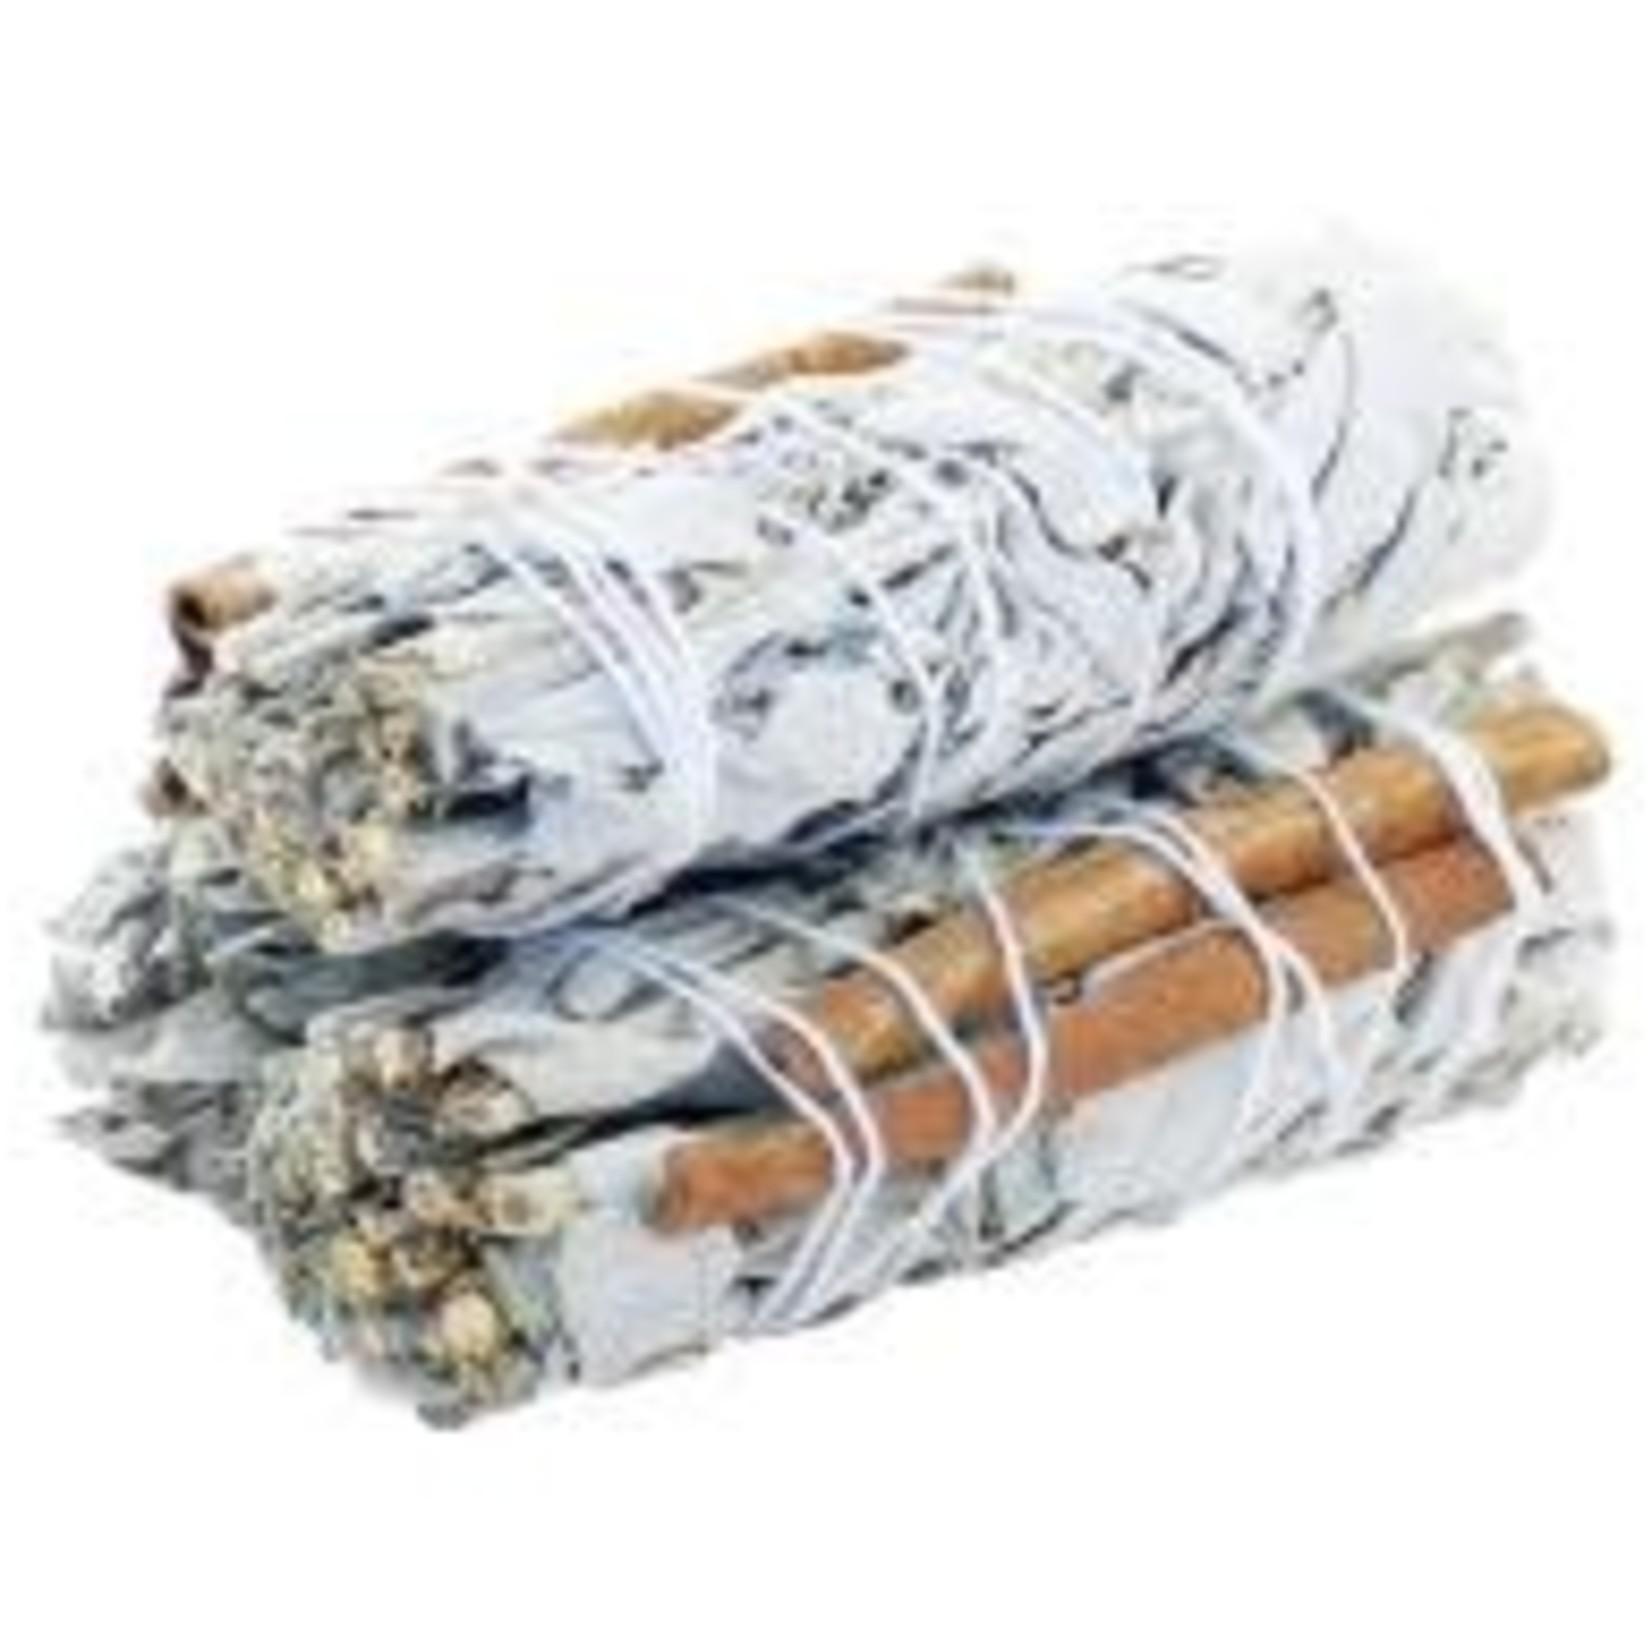 White Sage & Cinnamon Stick